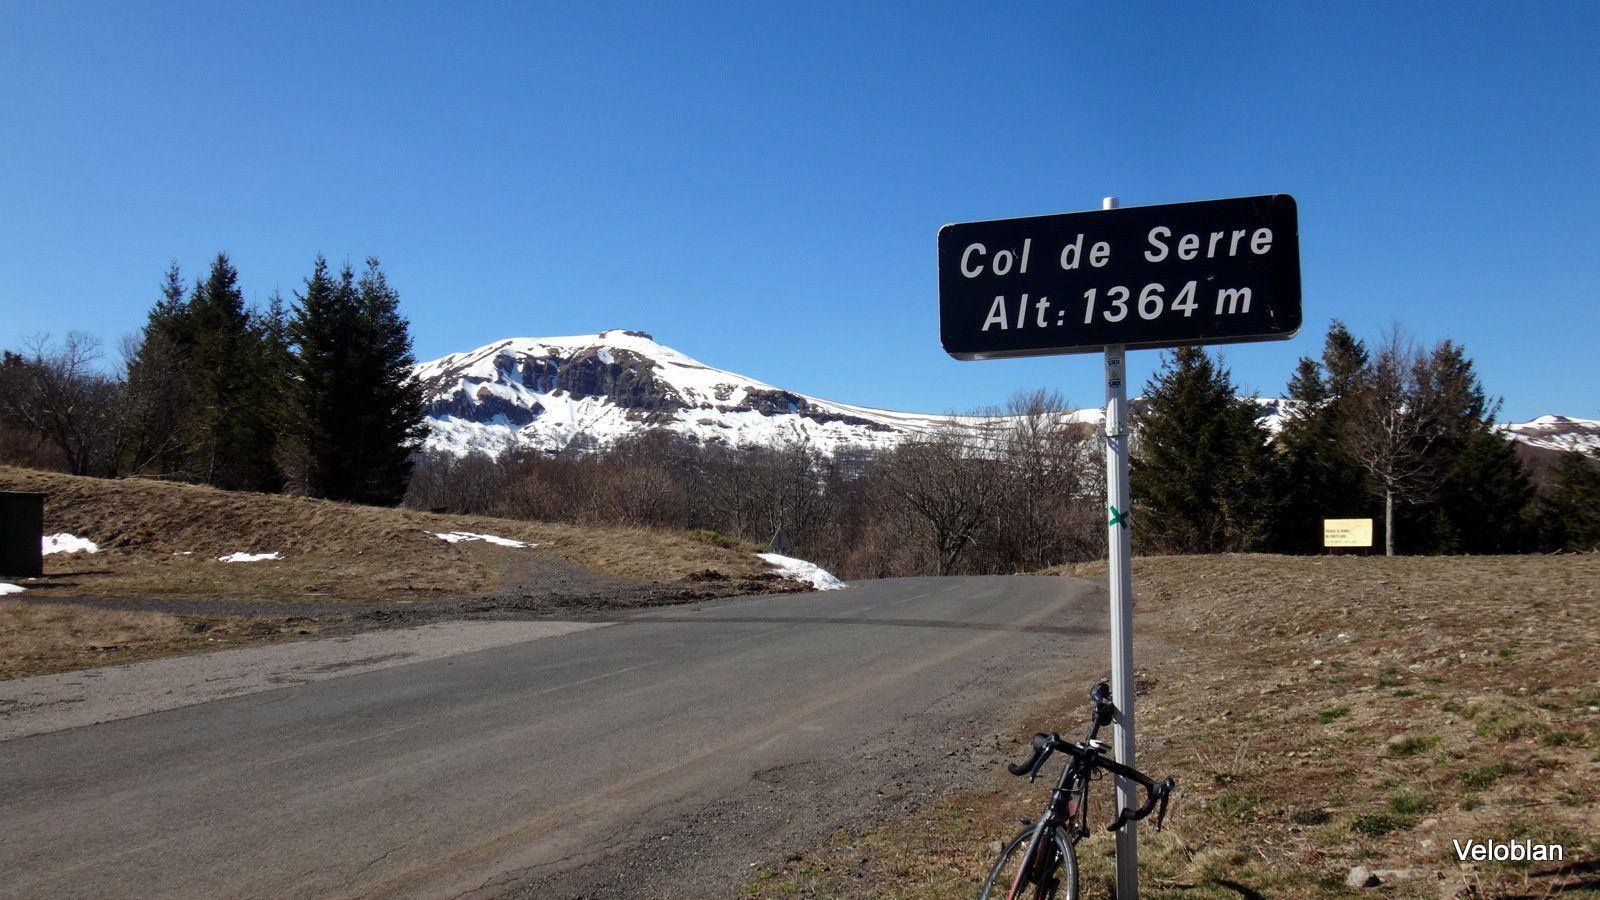 Balade dans le Cantal via le pas de Peyrol